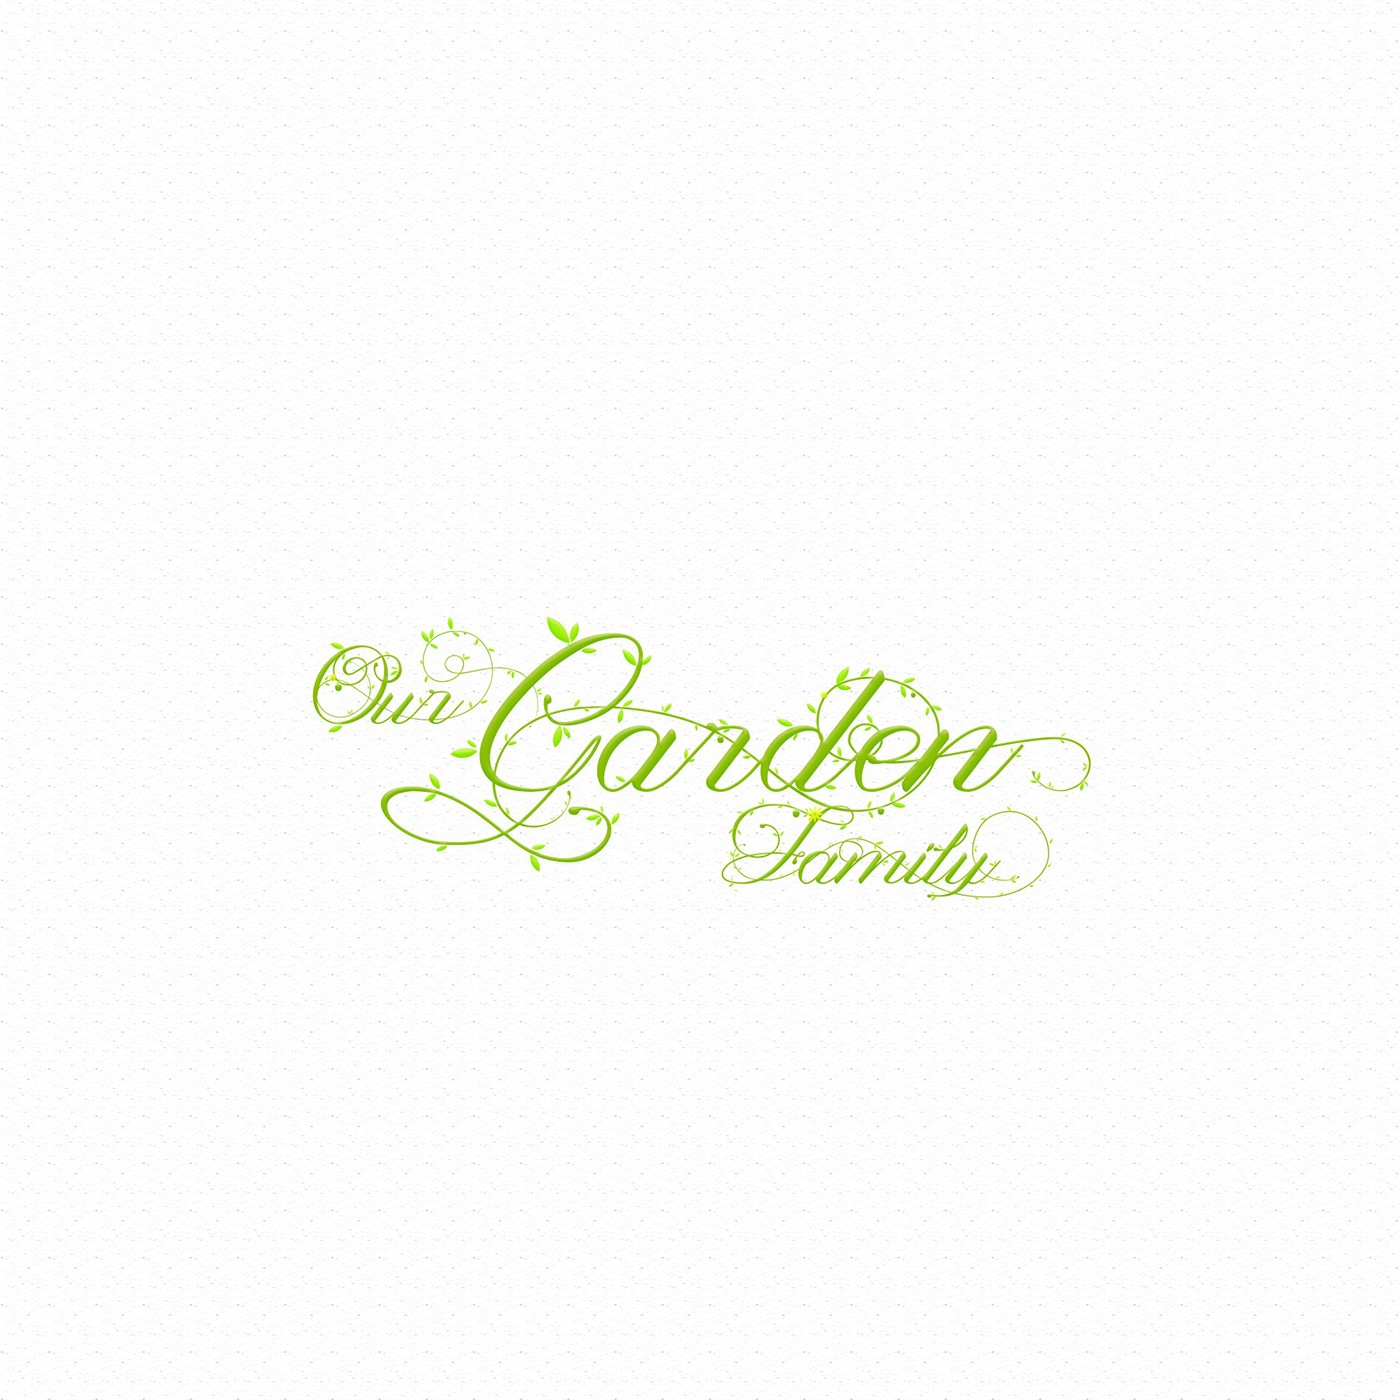 elegant environment fresh garden green landscaping leaf leaves natural Nature